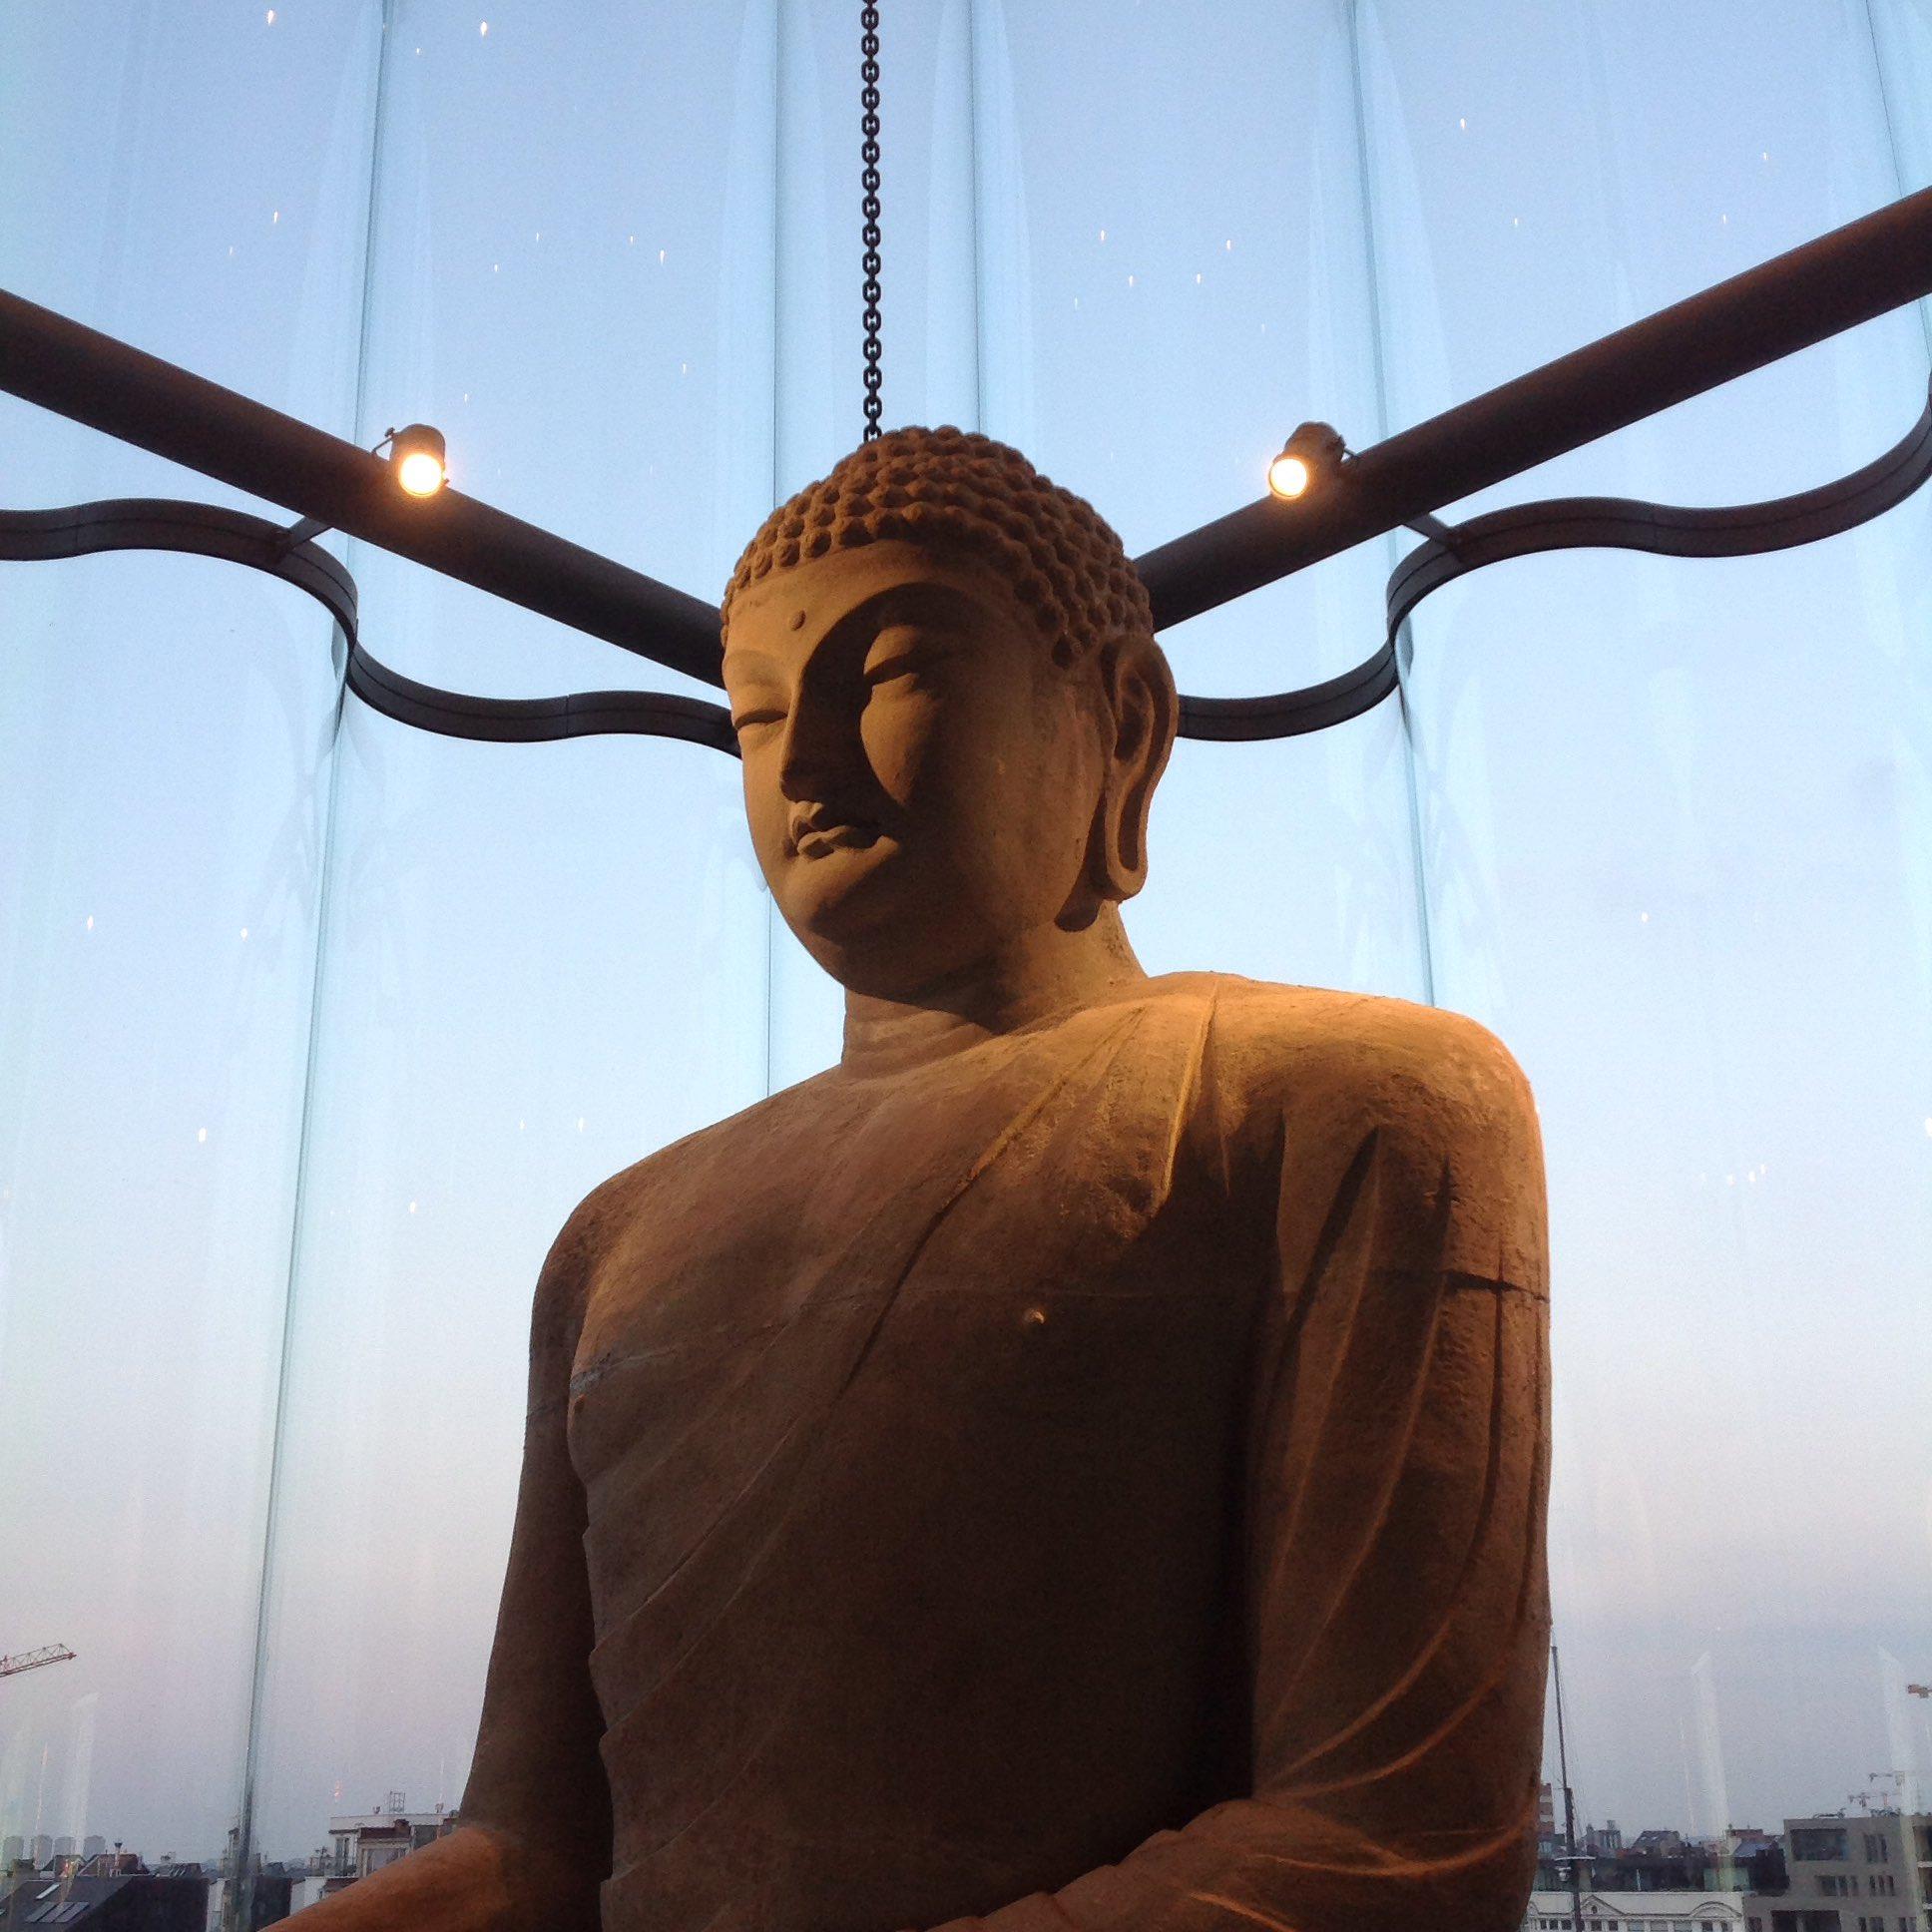 #oclock The plenary is coming but Buddha keeps us zen #museomixBE #museomix16 https://t.co/nIptftbnYt